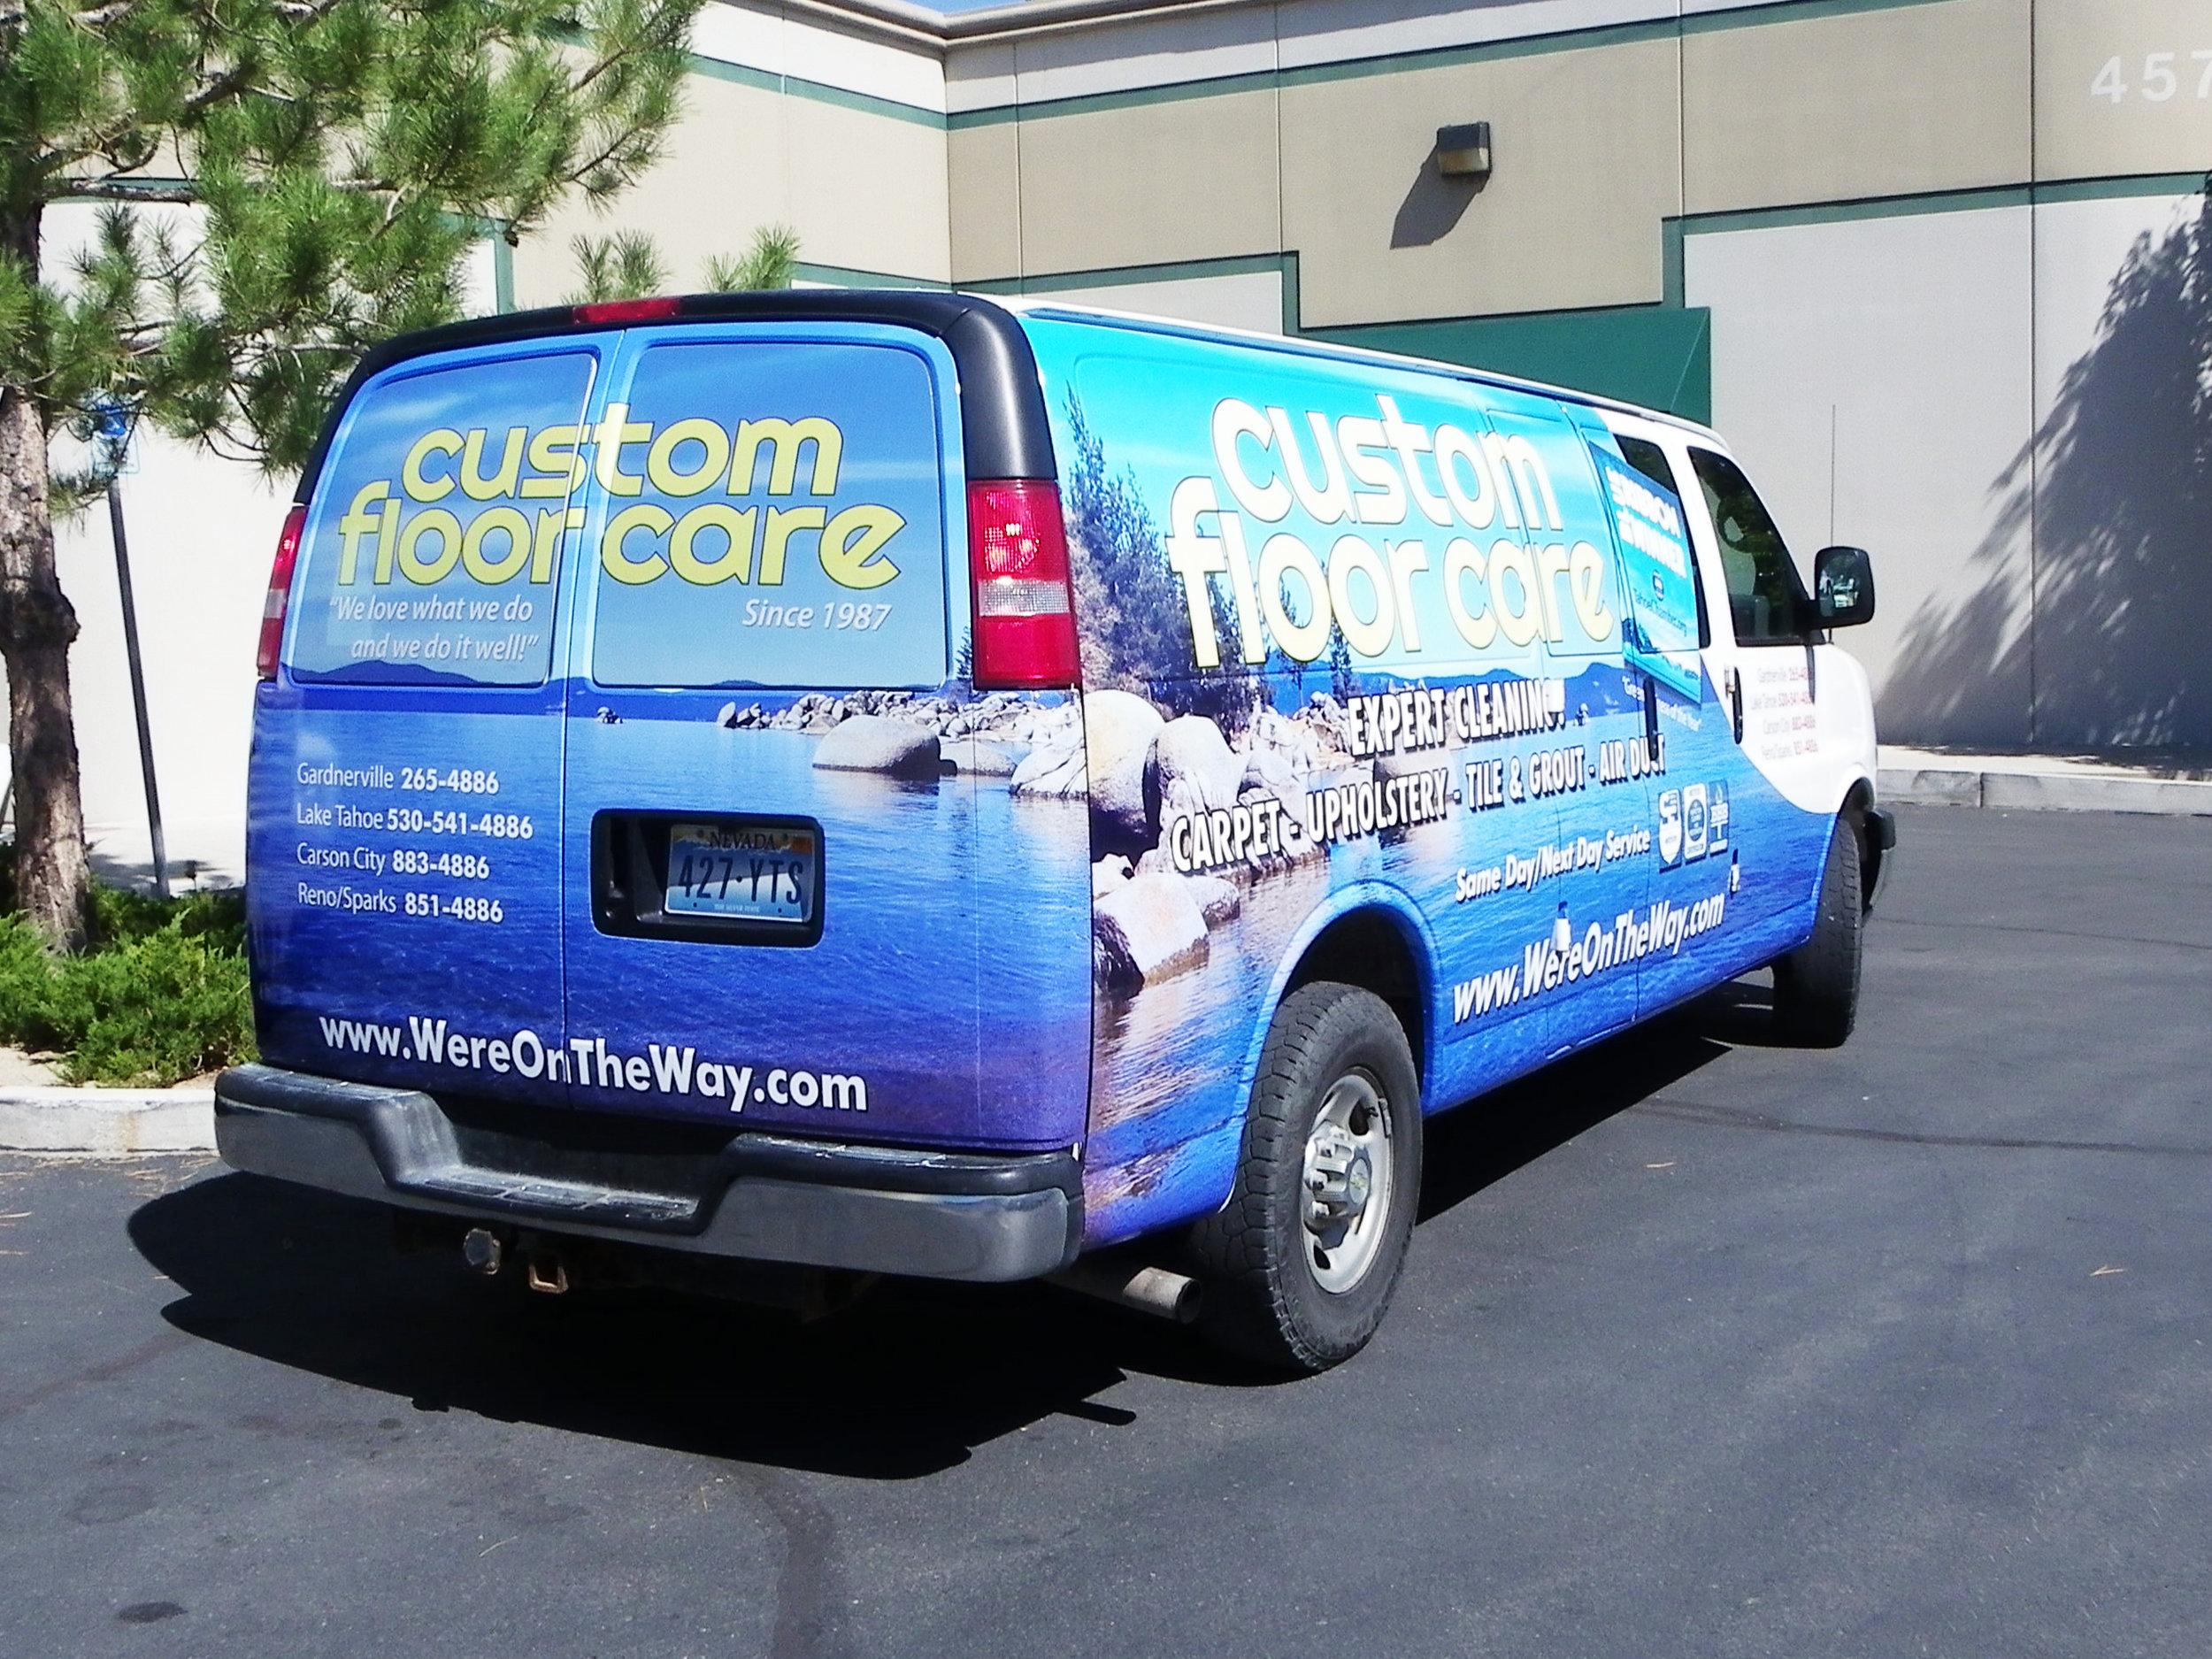 custom floor care.jpg